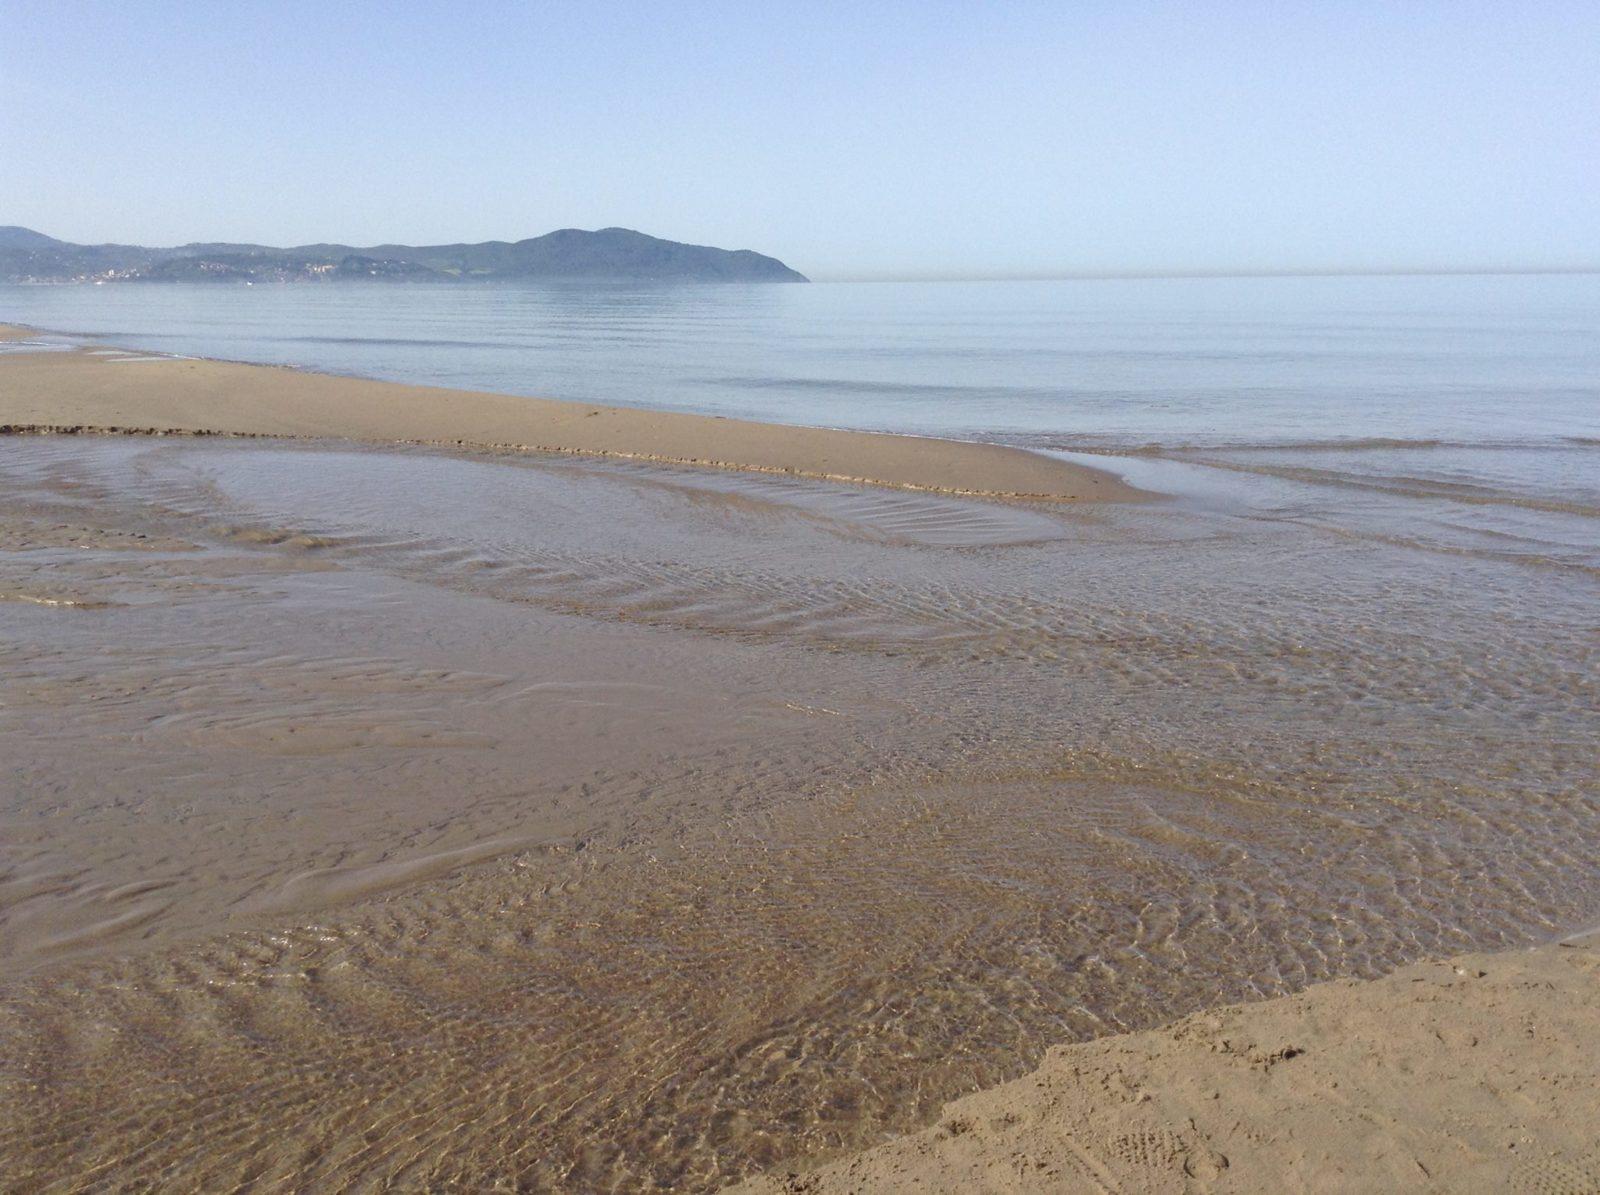 Spiaggia di licinella torre di paestum spiagge italiane su - Torre specchia spiaggia ...